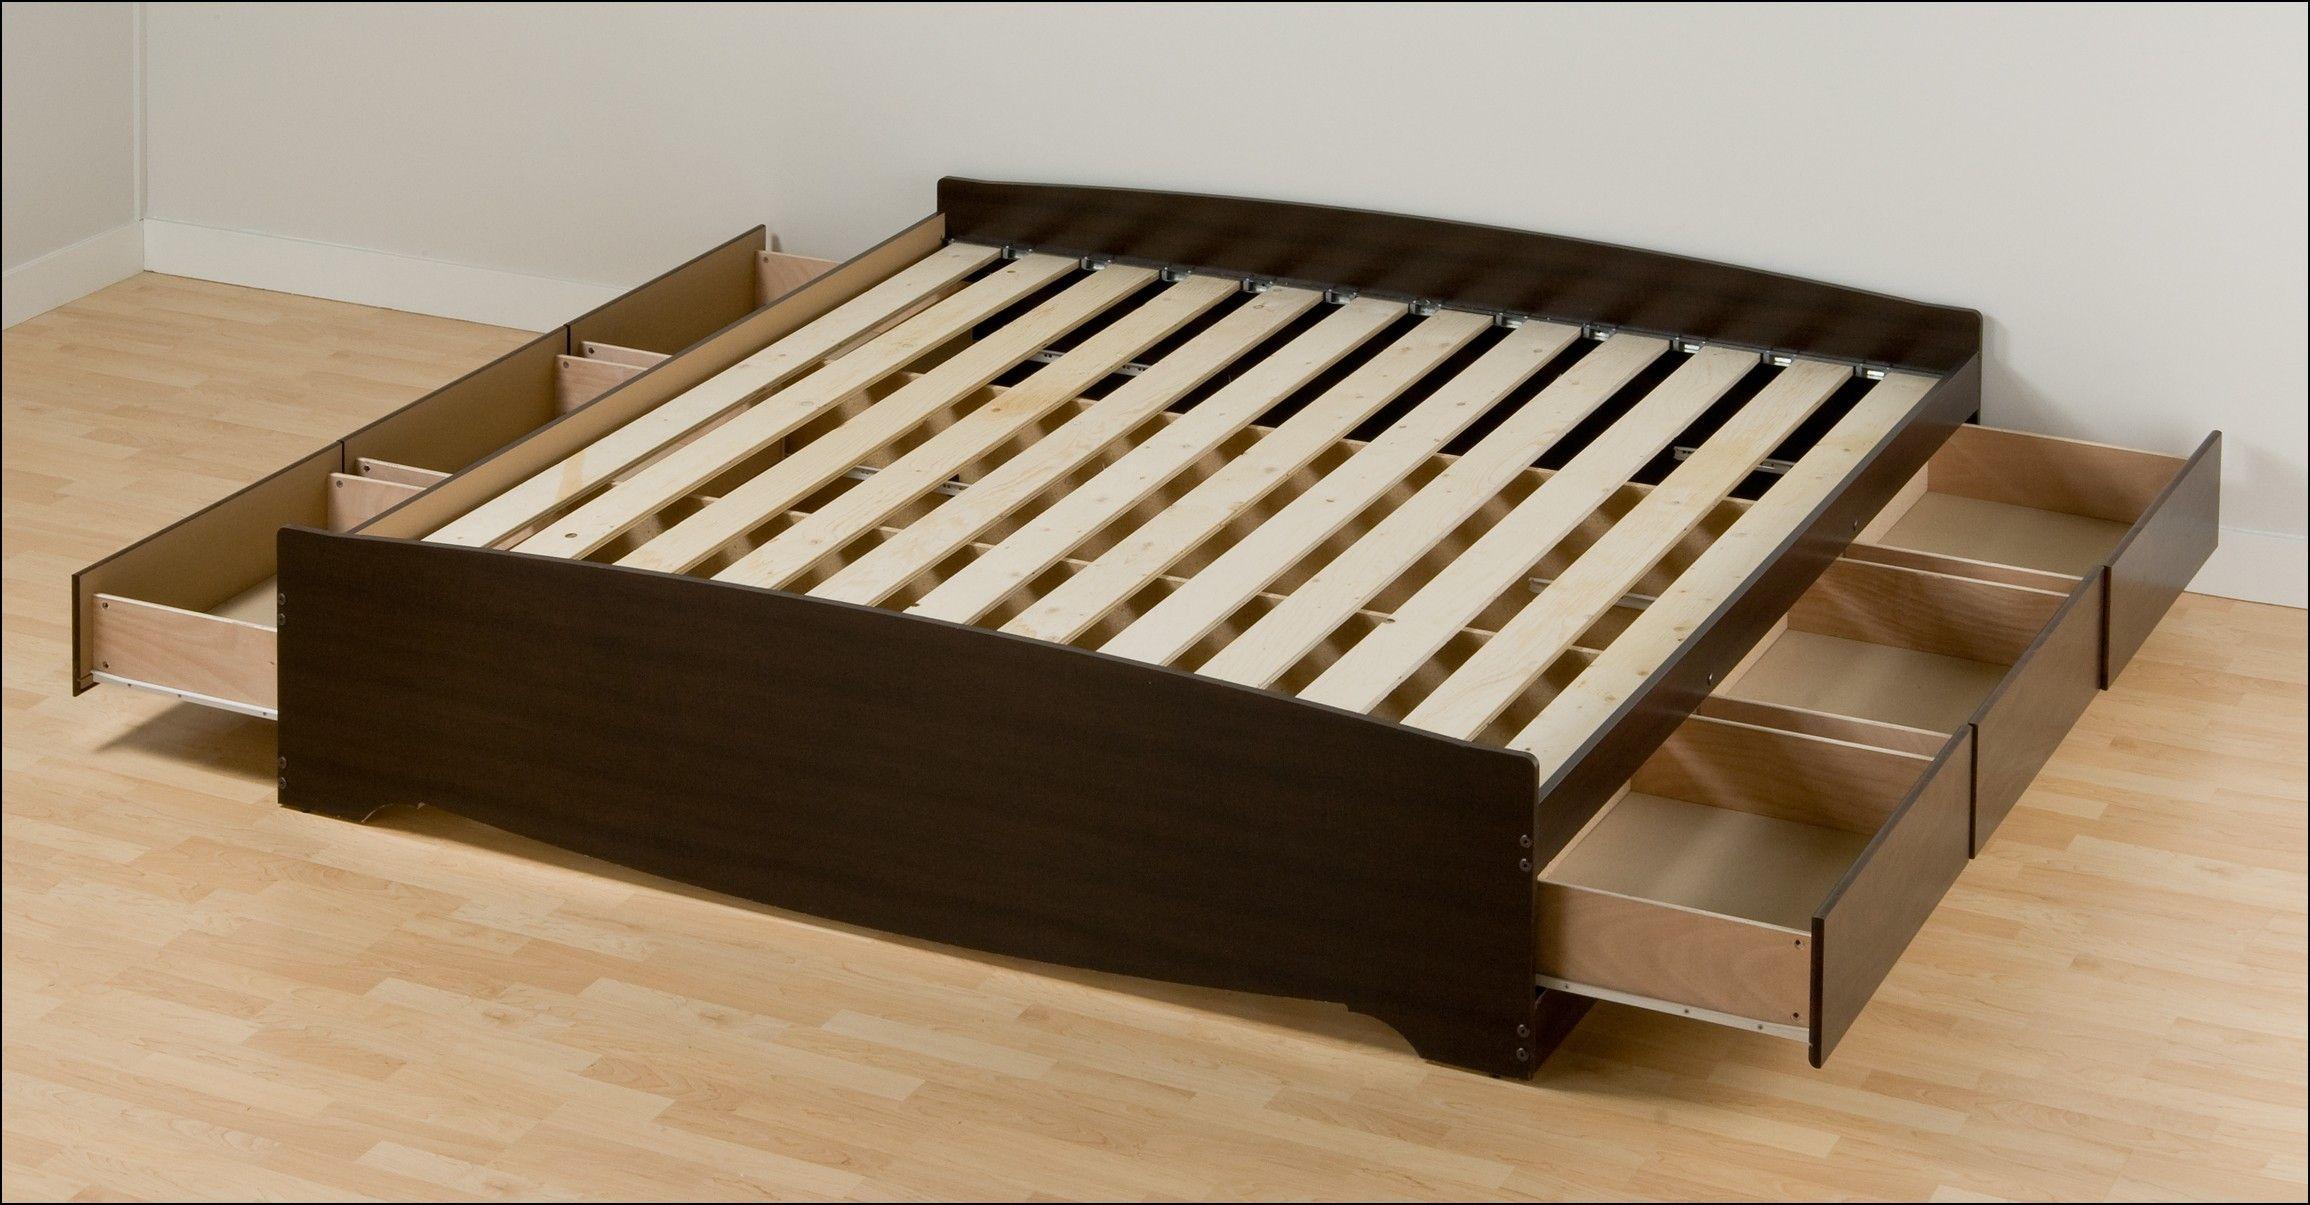 Platform Bed Frame for Memory Foam Mattress Bed with